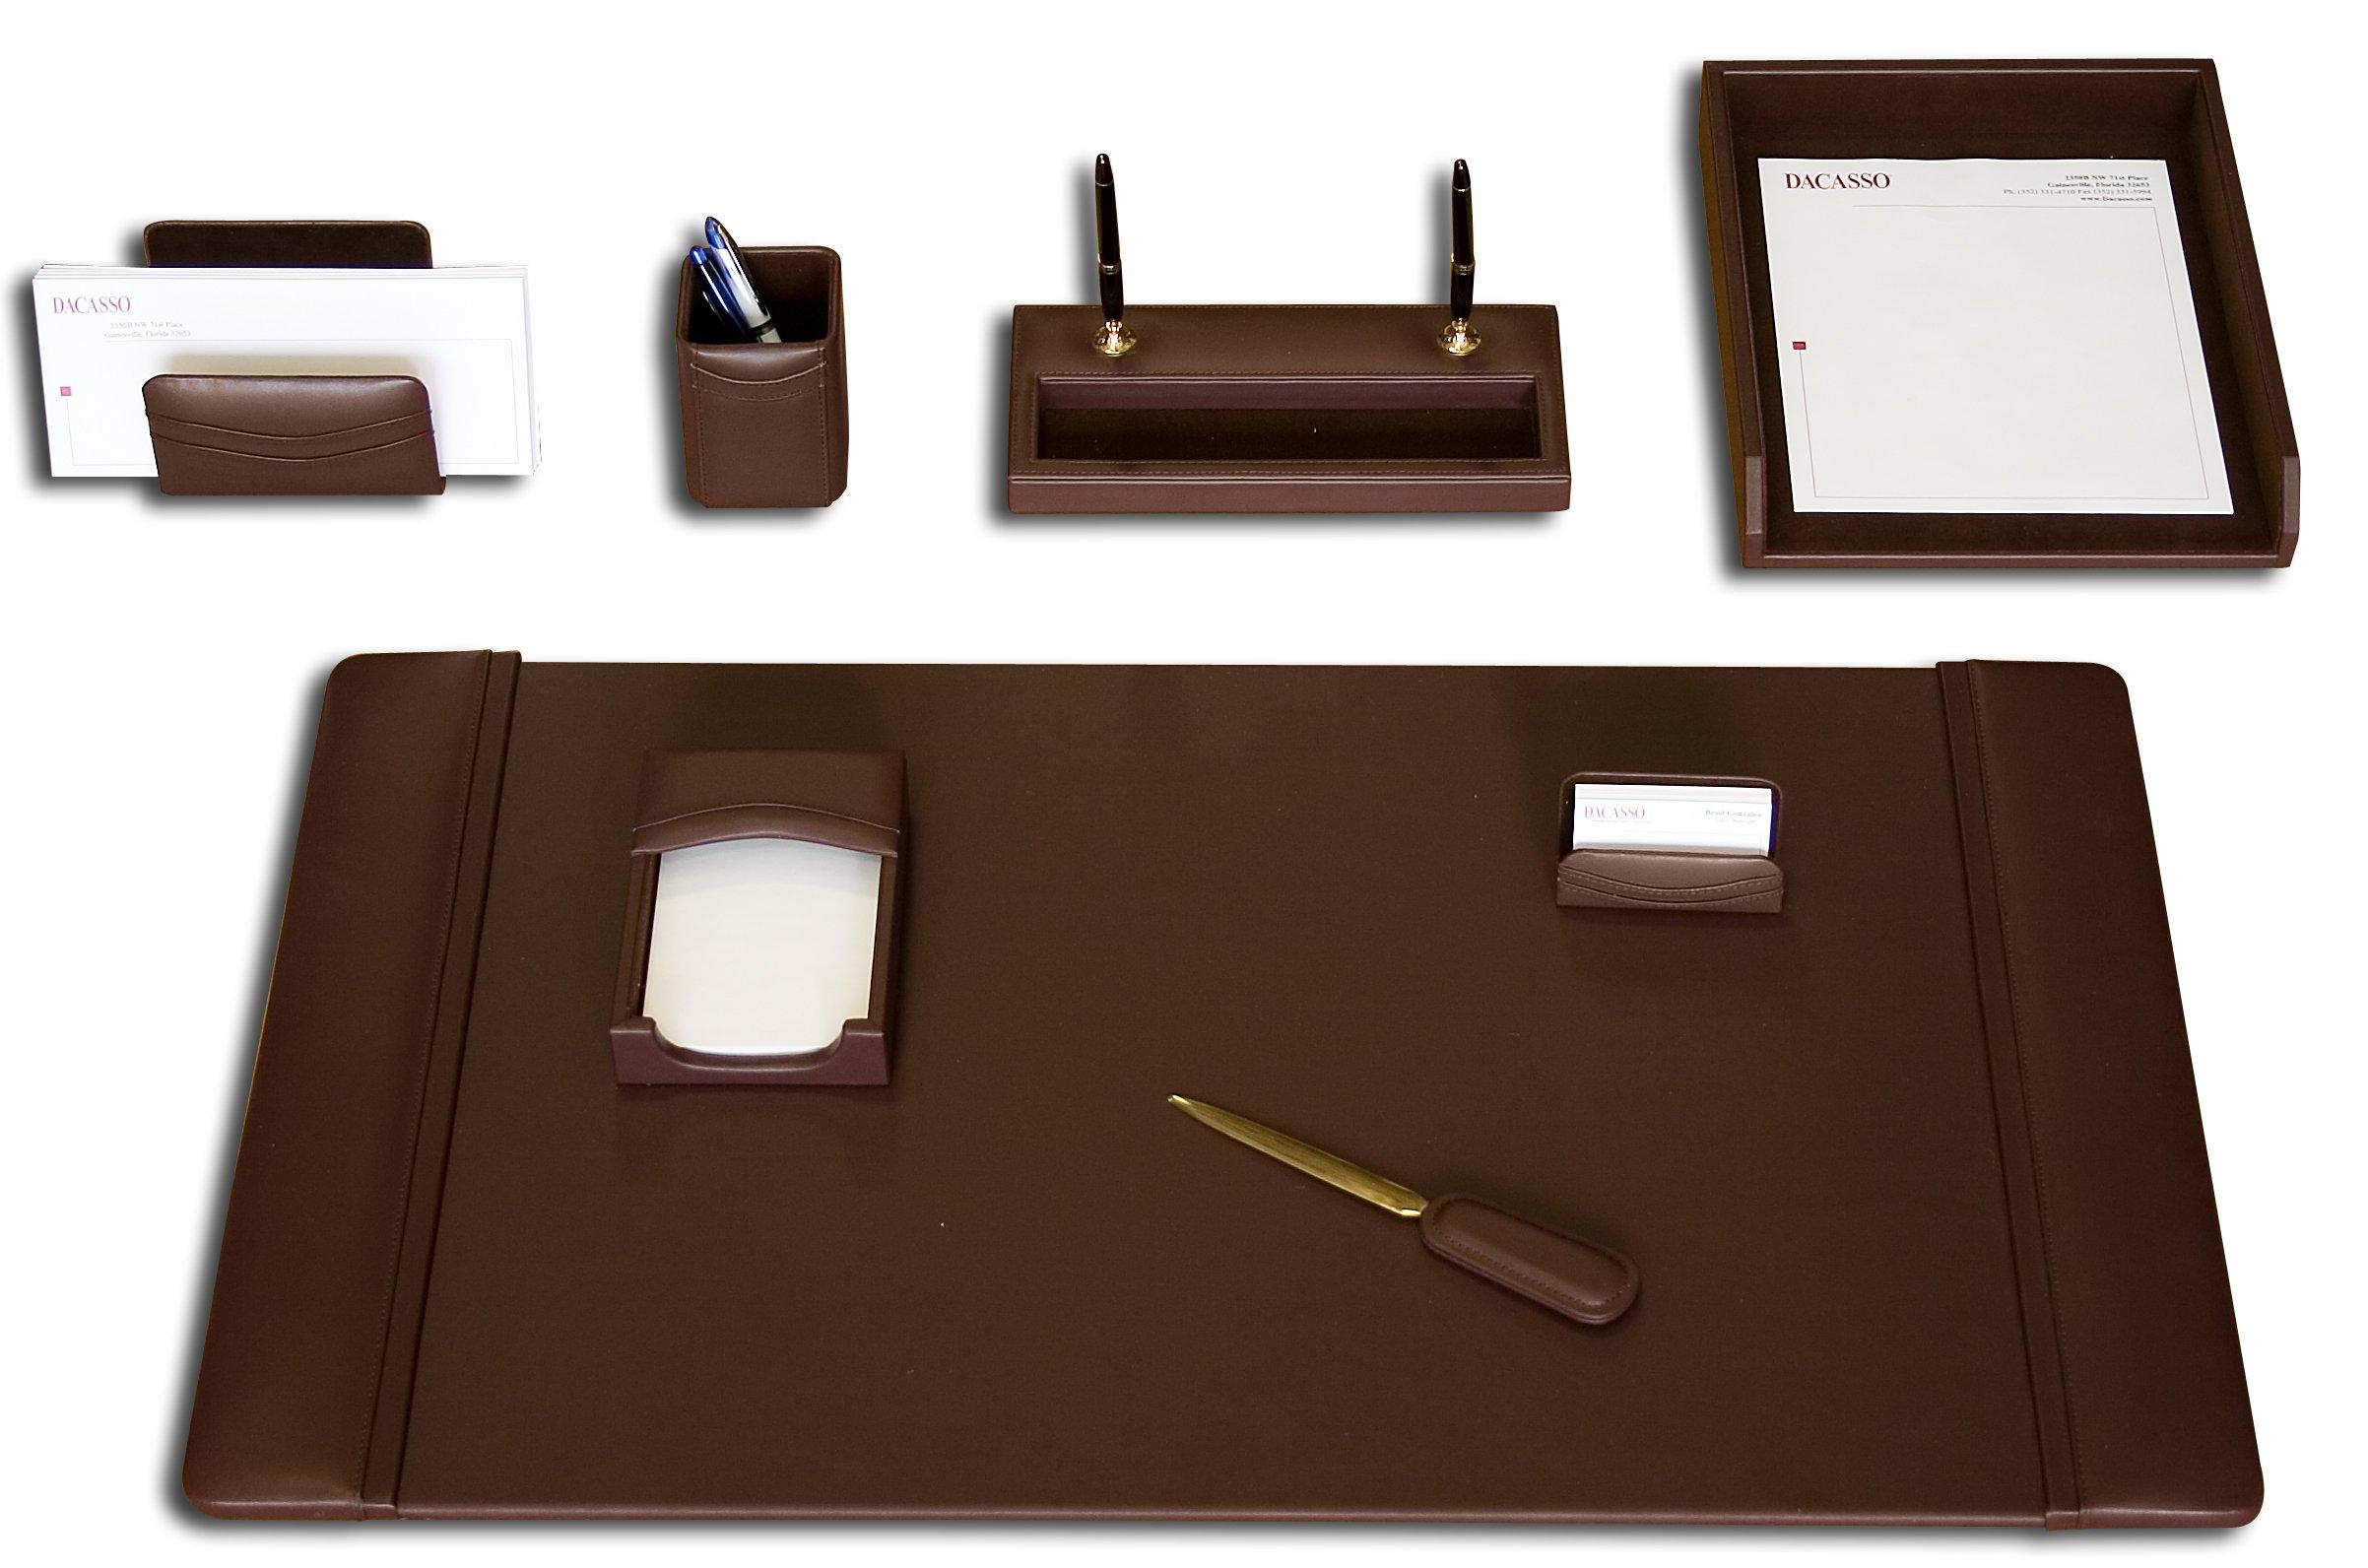 Dacasso Leather Desk Set, 8-Piece, Chocolate Brown